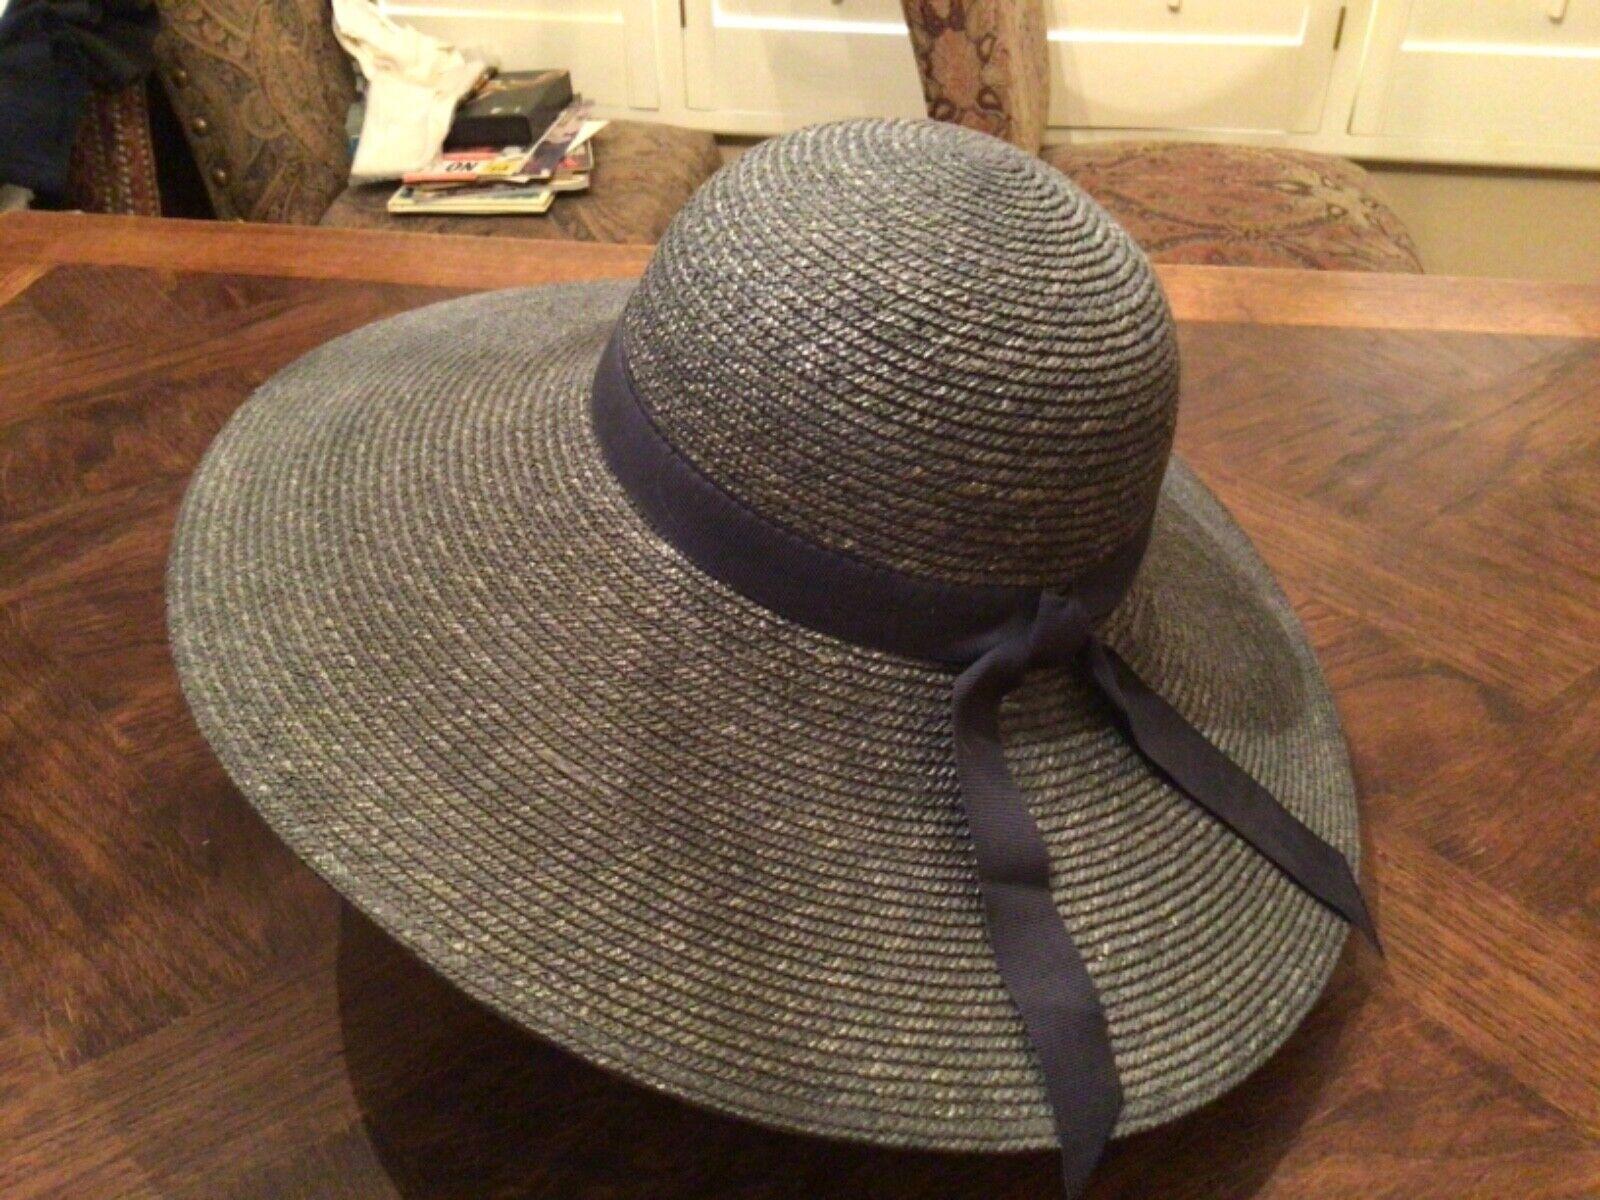 VINTAGE WIDE BRIM ITALIAN STRAW HAT - image 1